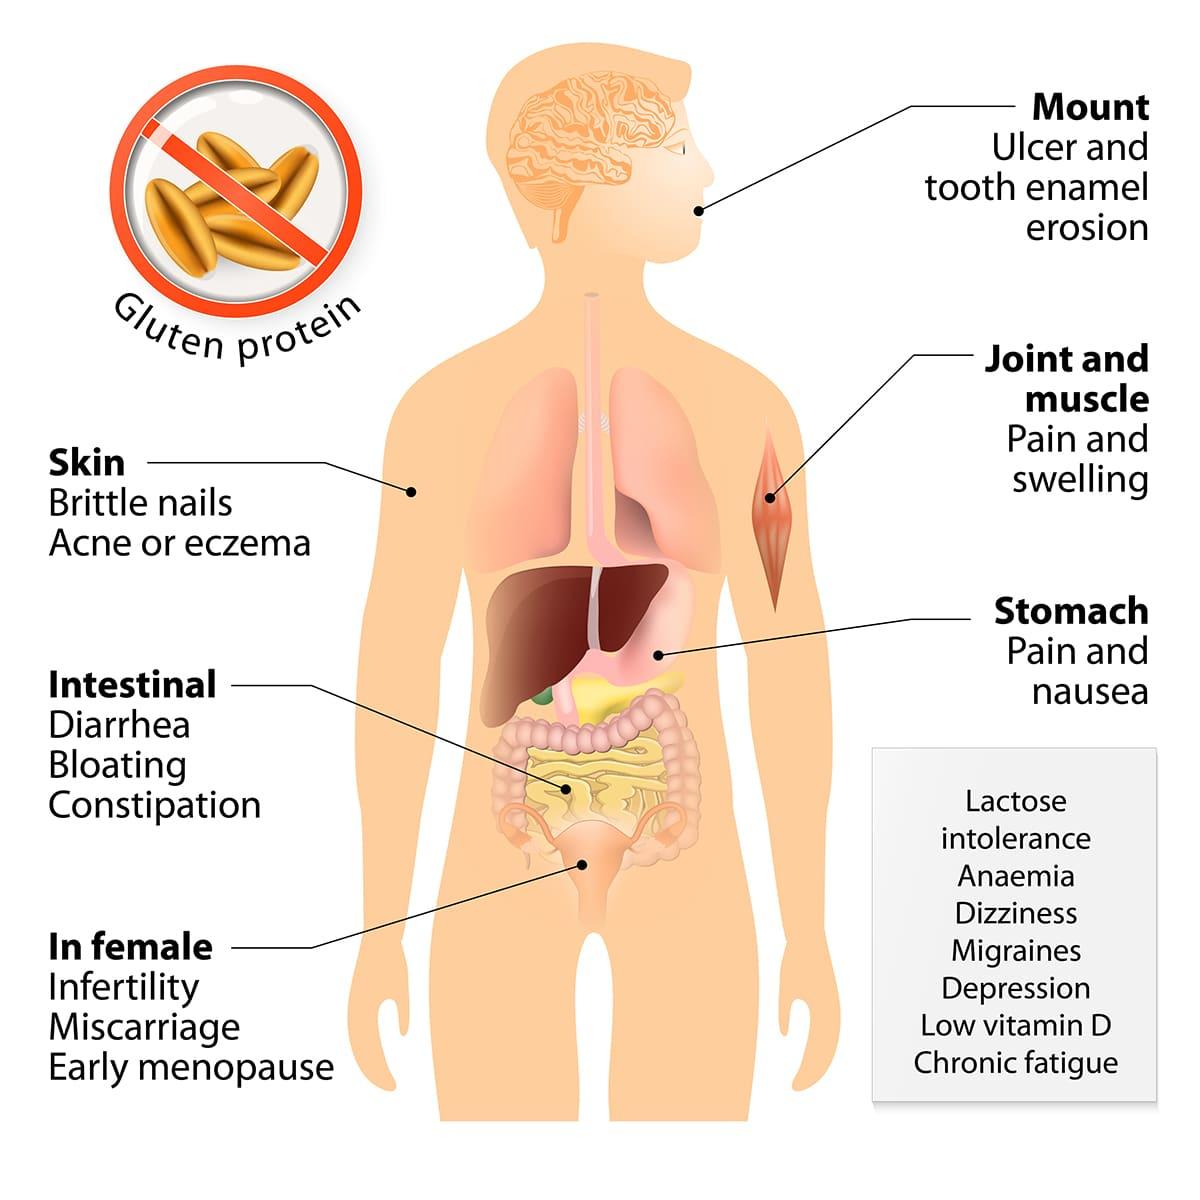 illustration on the symptoms of celiac disease on the human anatomy